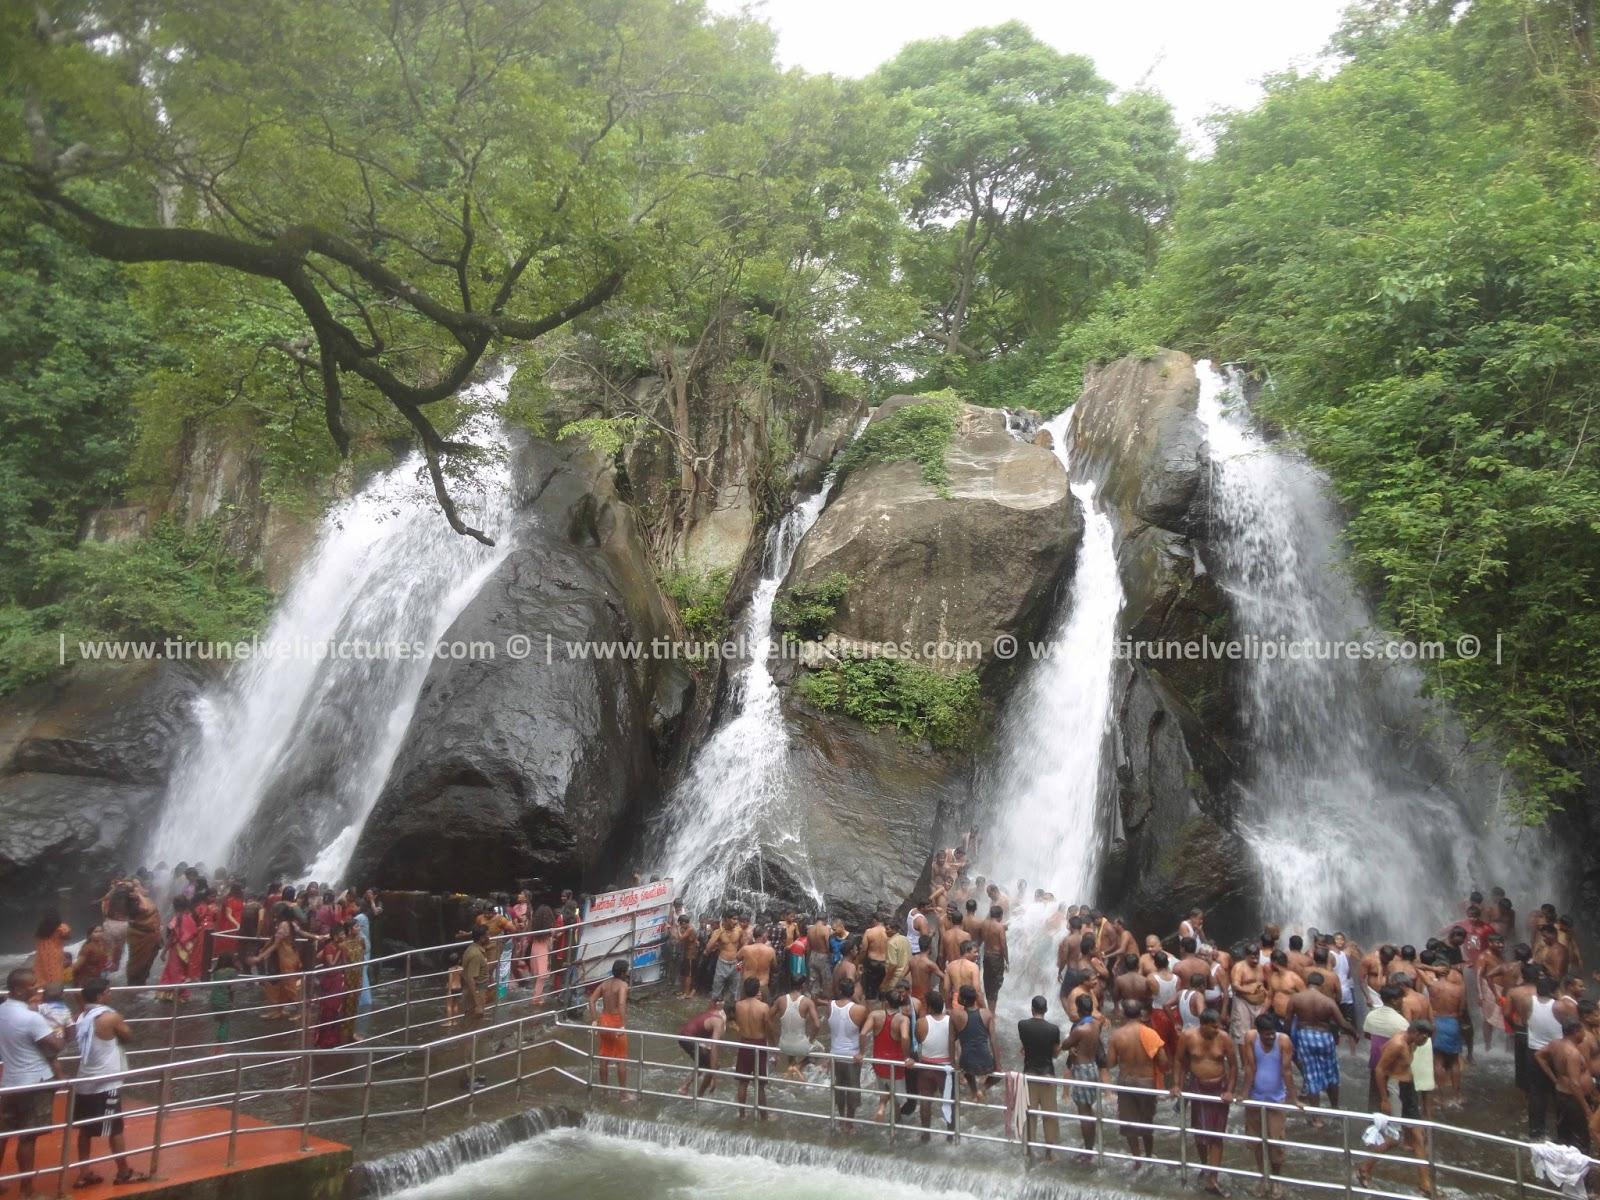 Courtallam India  City pictures : Five Falls Pictures | Courtallam Pictures | Courtallam | Courtallam ...